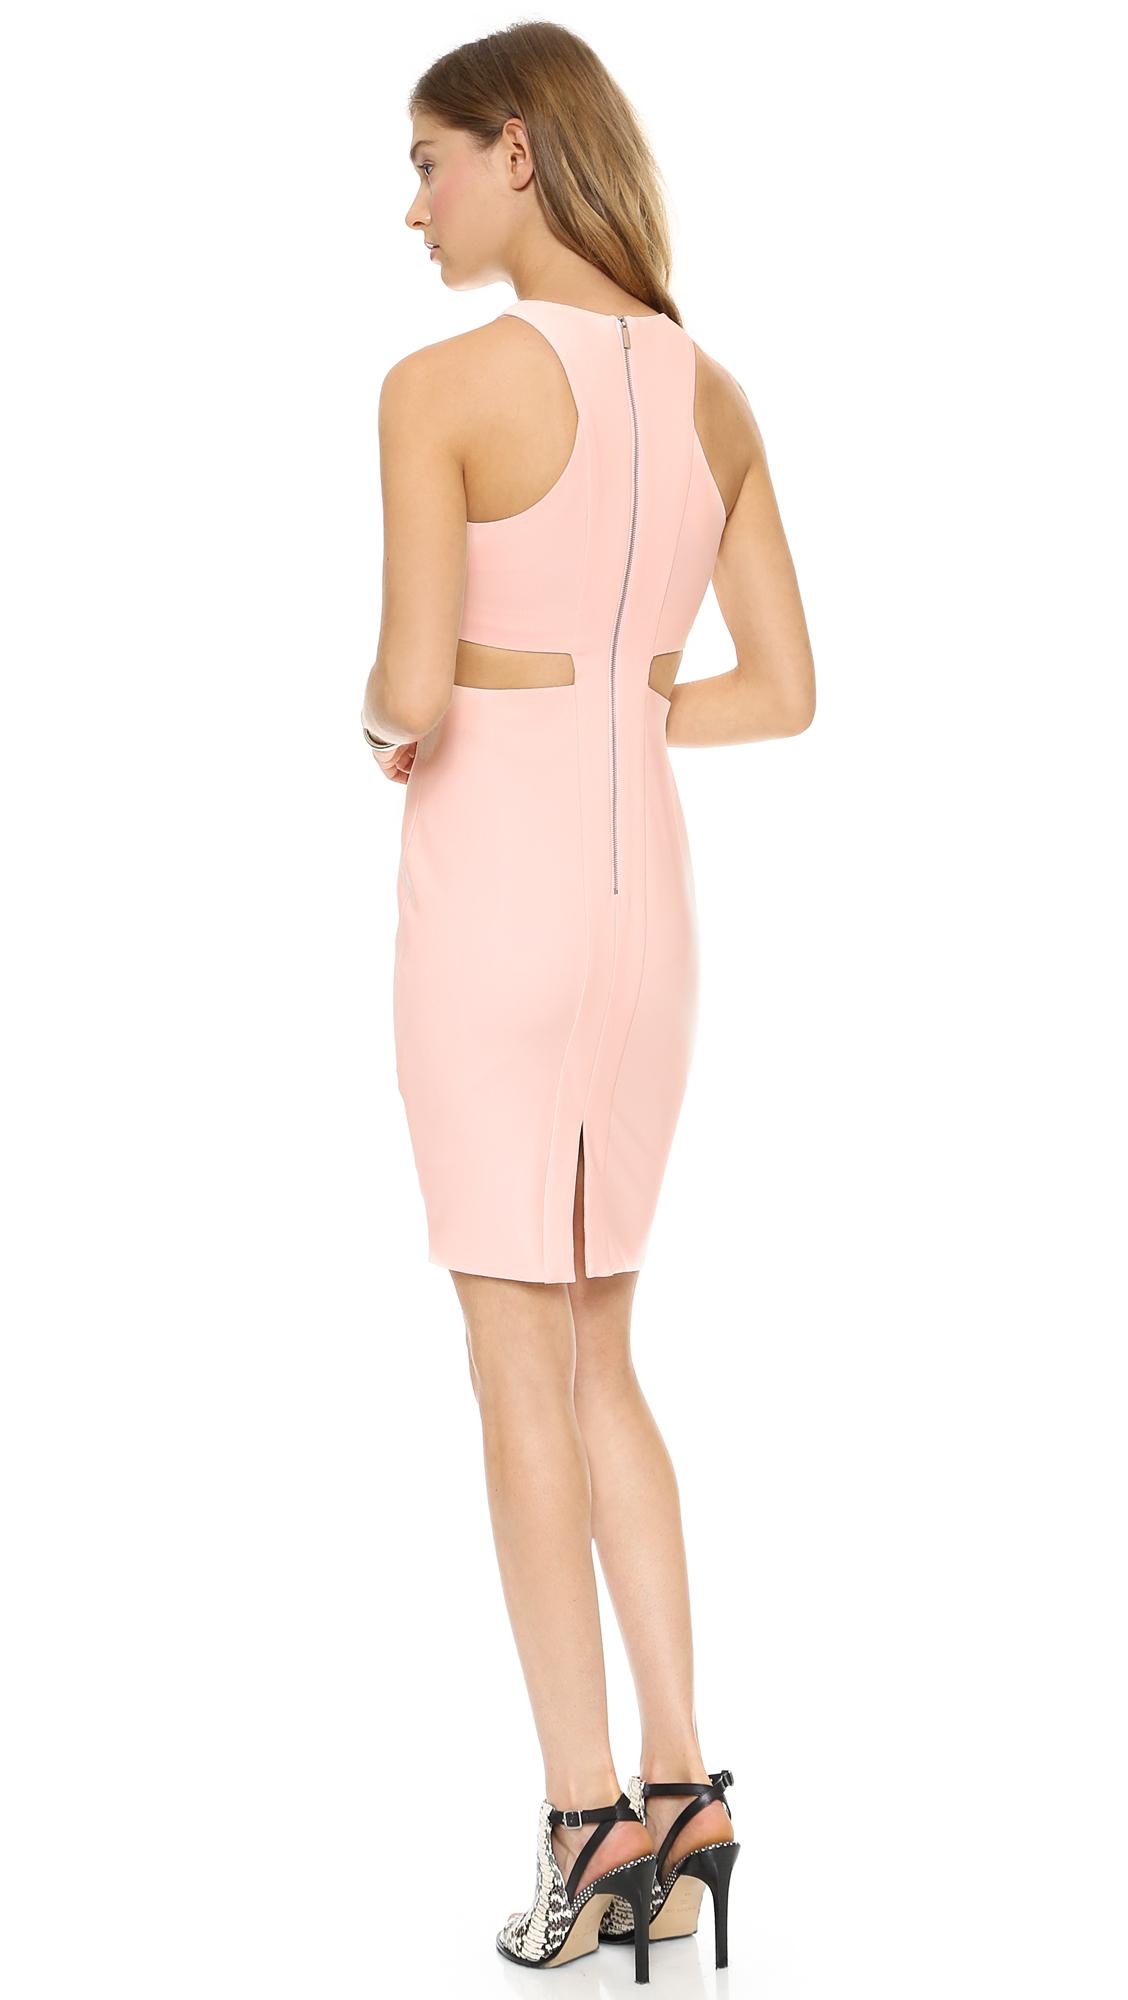 elizabeth and james lela cutout dress in pink peony pink lyst. Black Bedroom Furniture Sets. Home Design Ideas